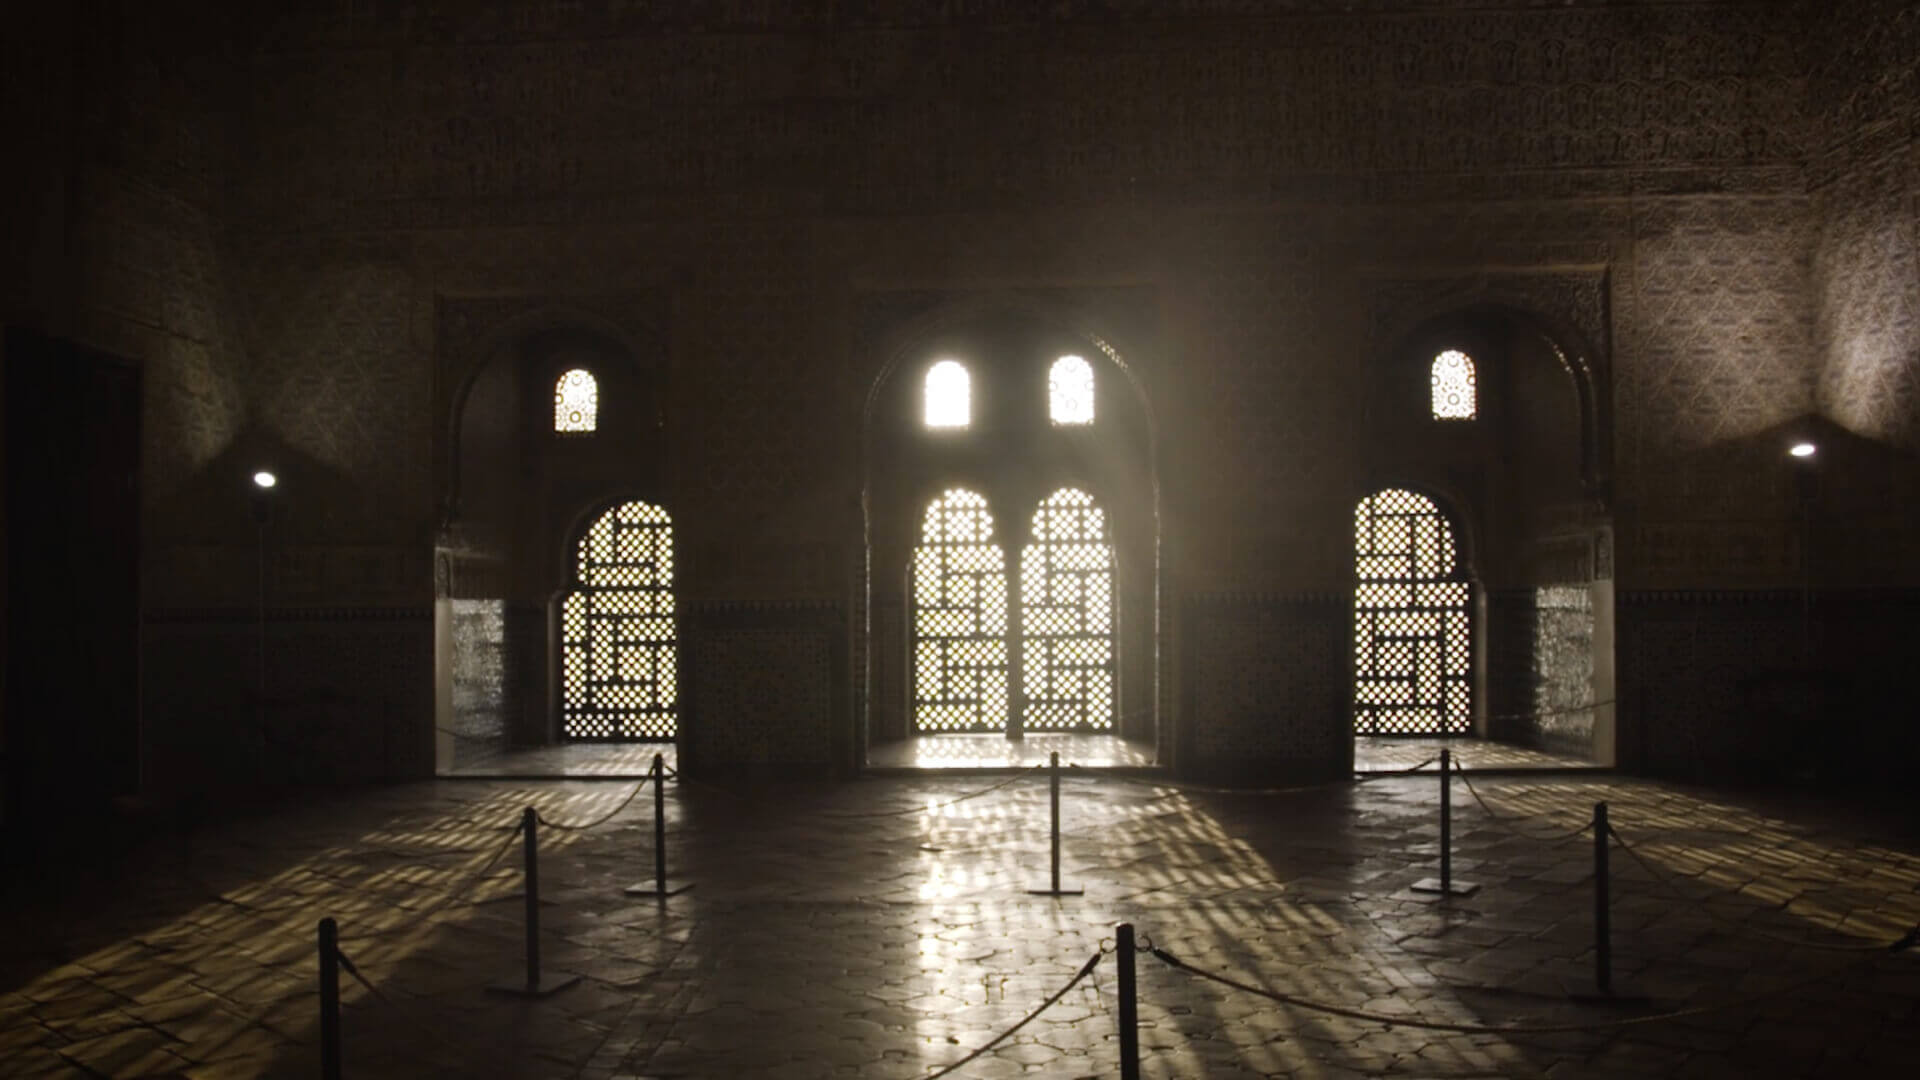 Momentos Alhambra - Descubre la Alhambra - Cervezas Alhambra